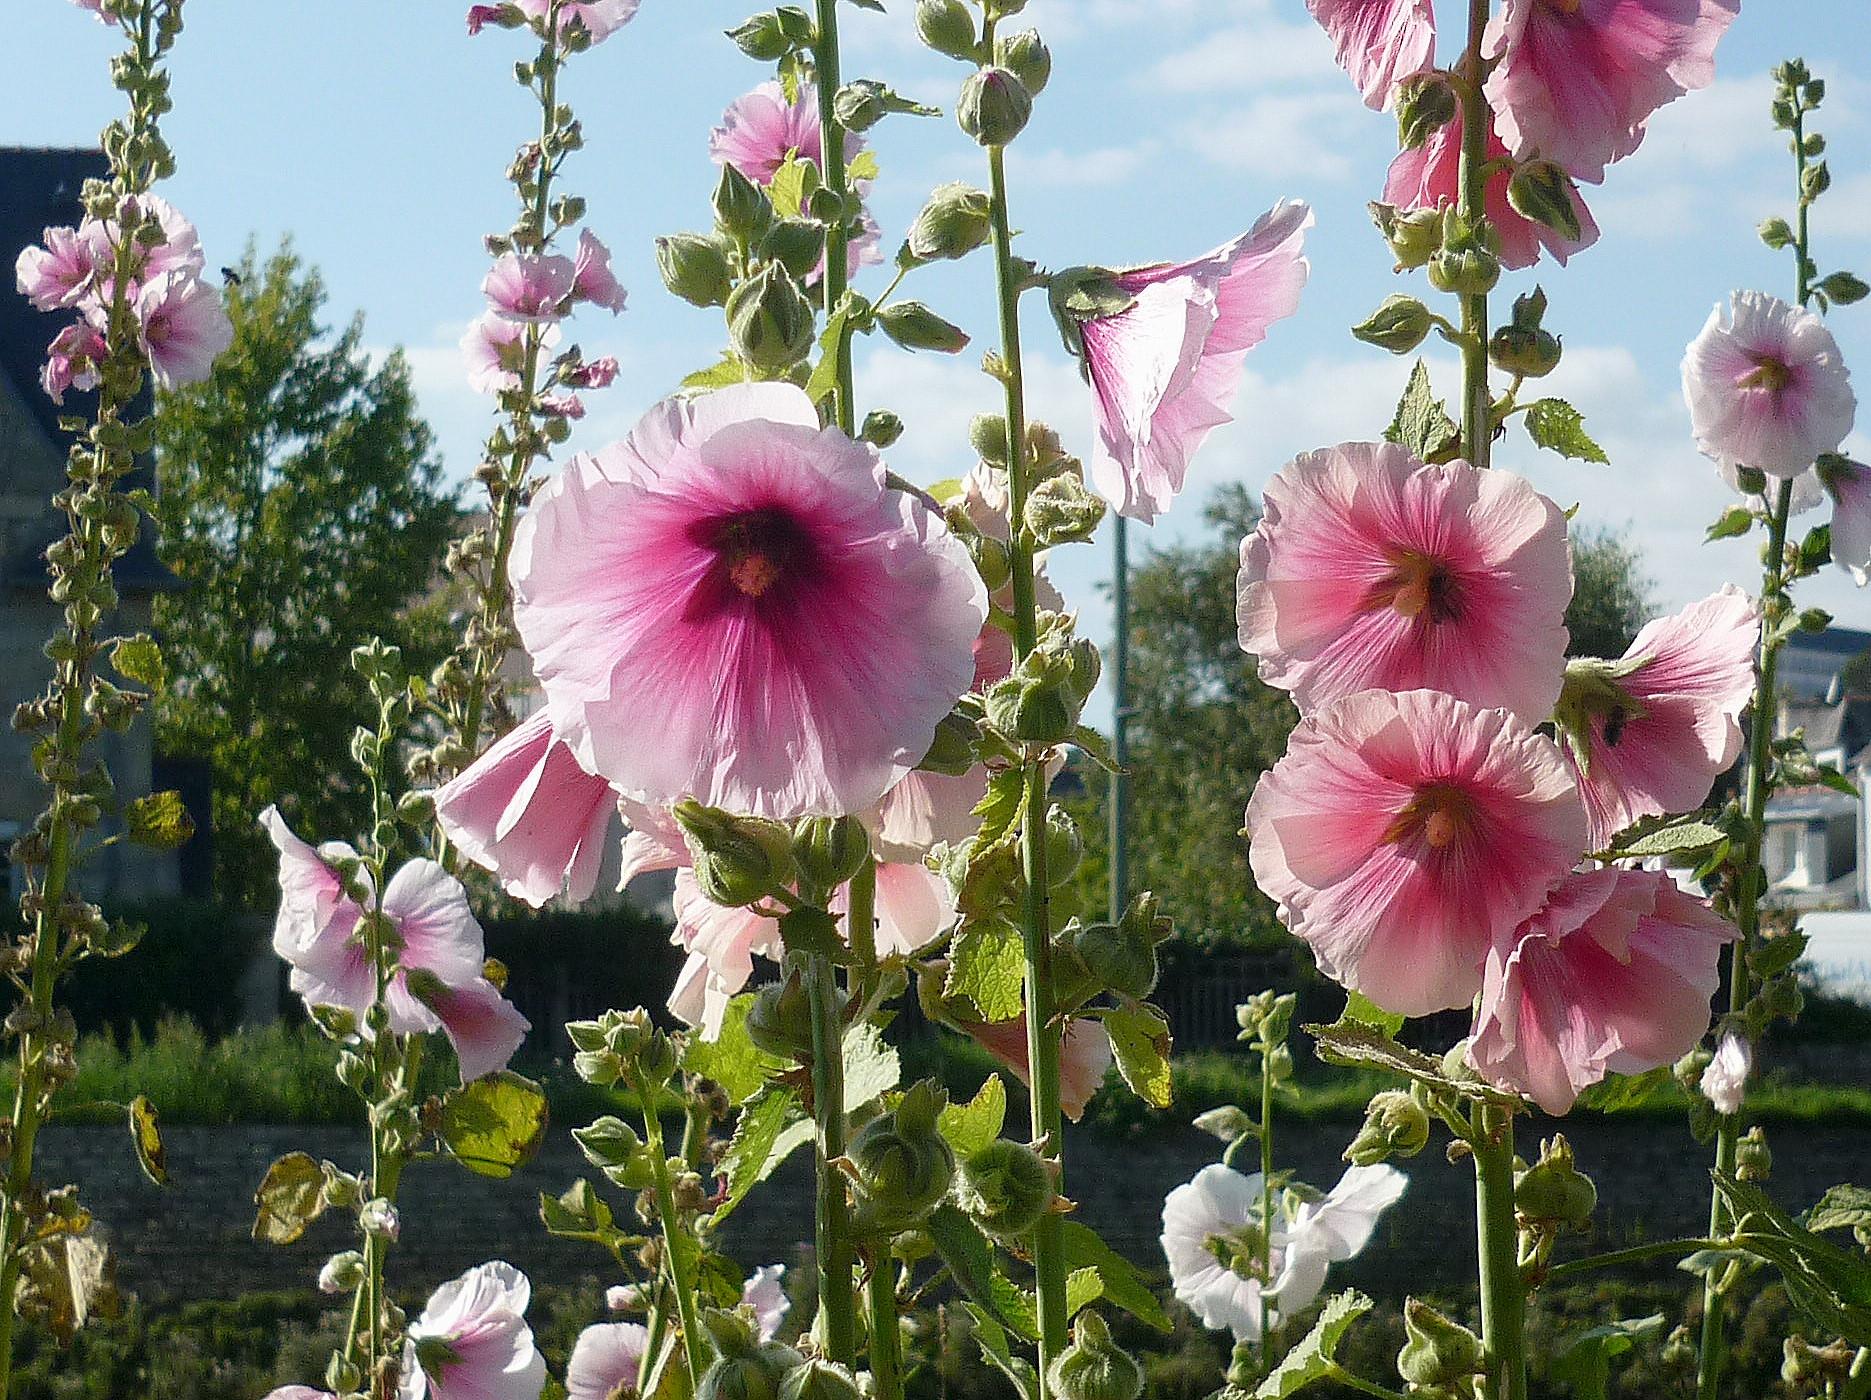 Roses tr mi res les taxinomes - Planter des roses tremieres ...